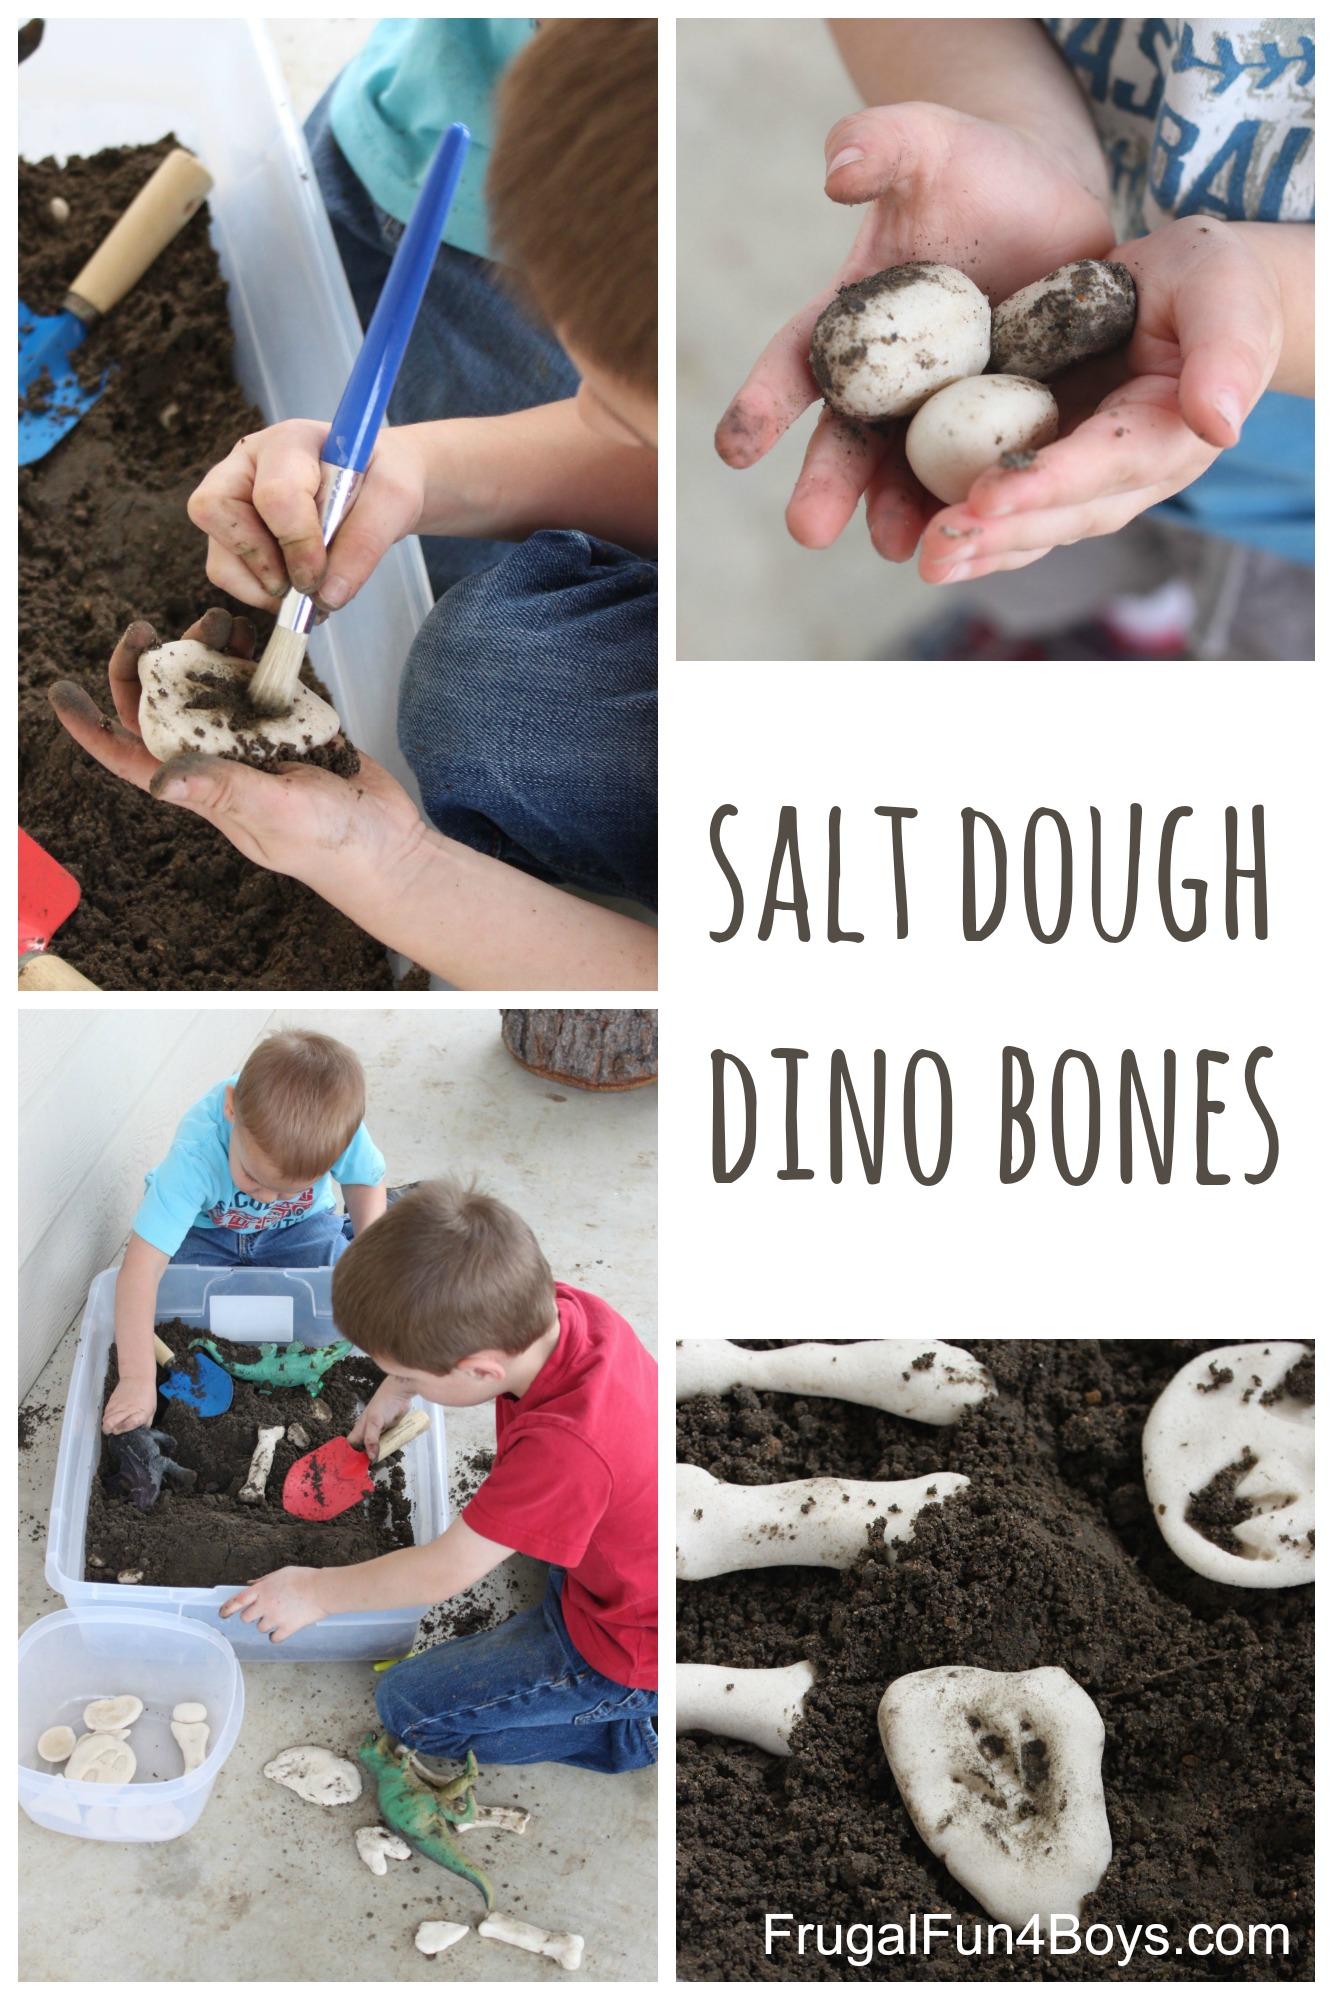 Digging for Salt Dough Dinosaur Bones